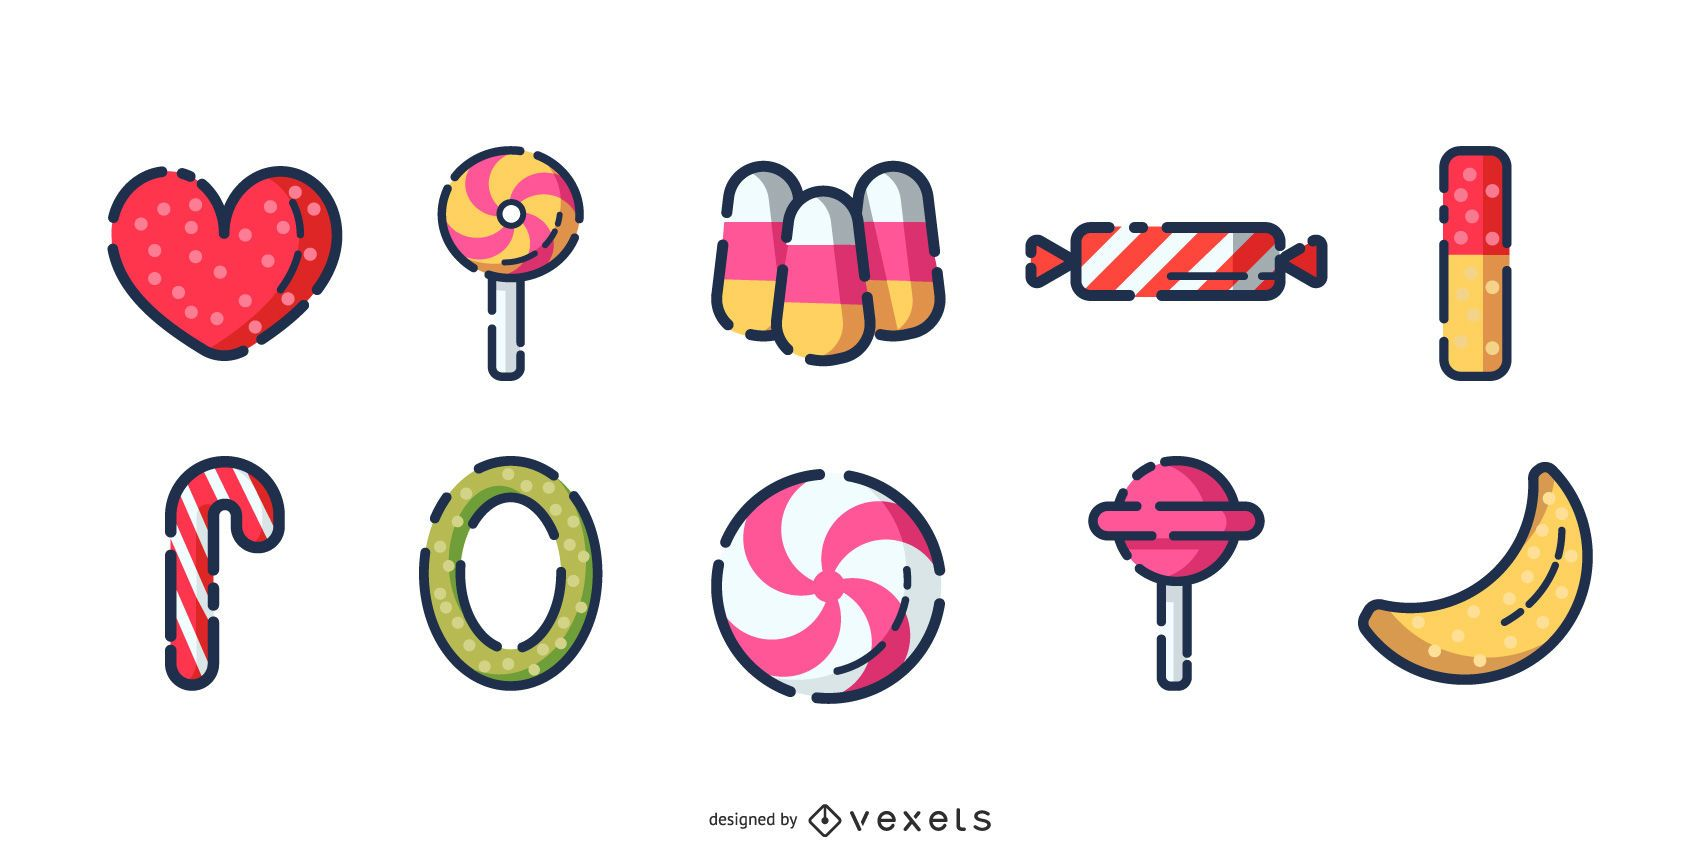 Candy stroke icon set